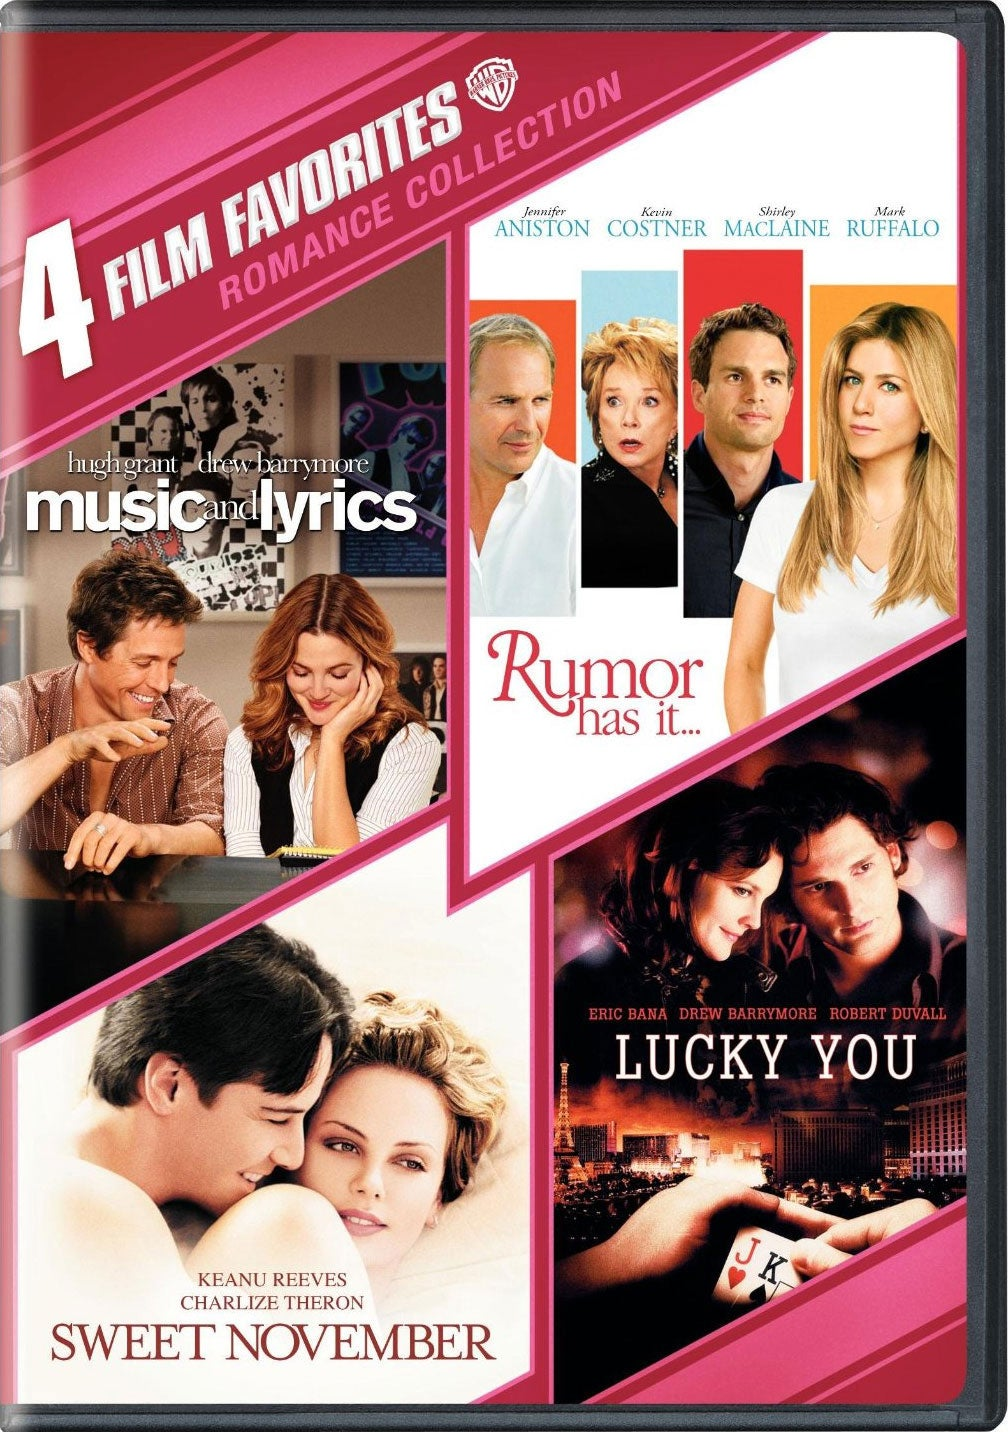 4 Film Favorites: Romance Collection (DVD)